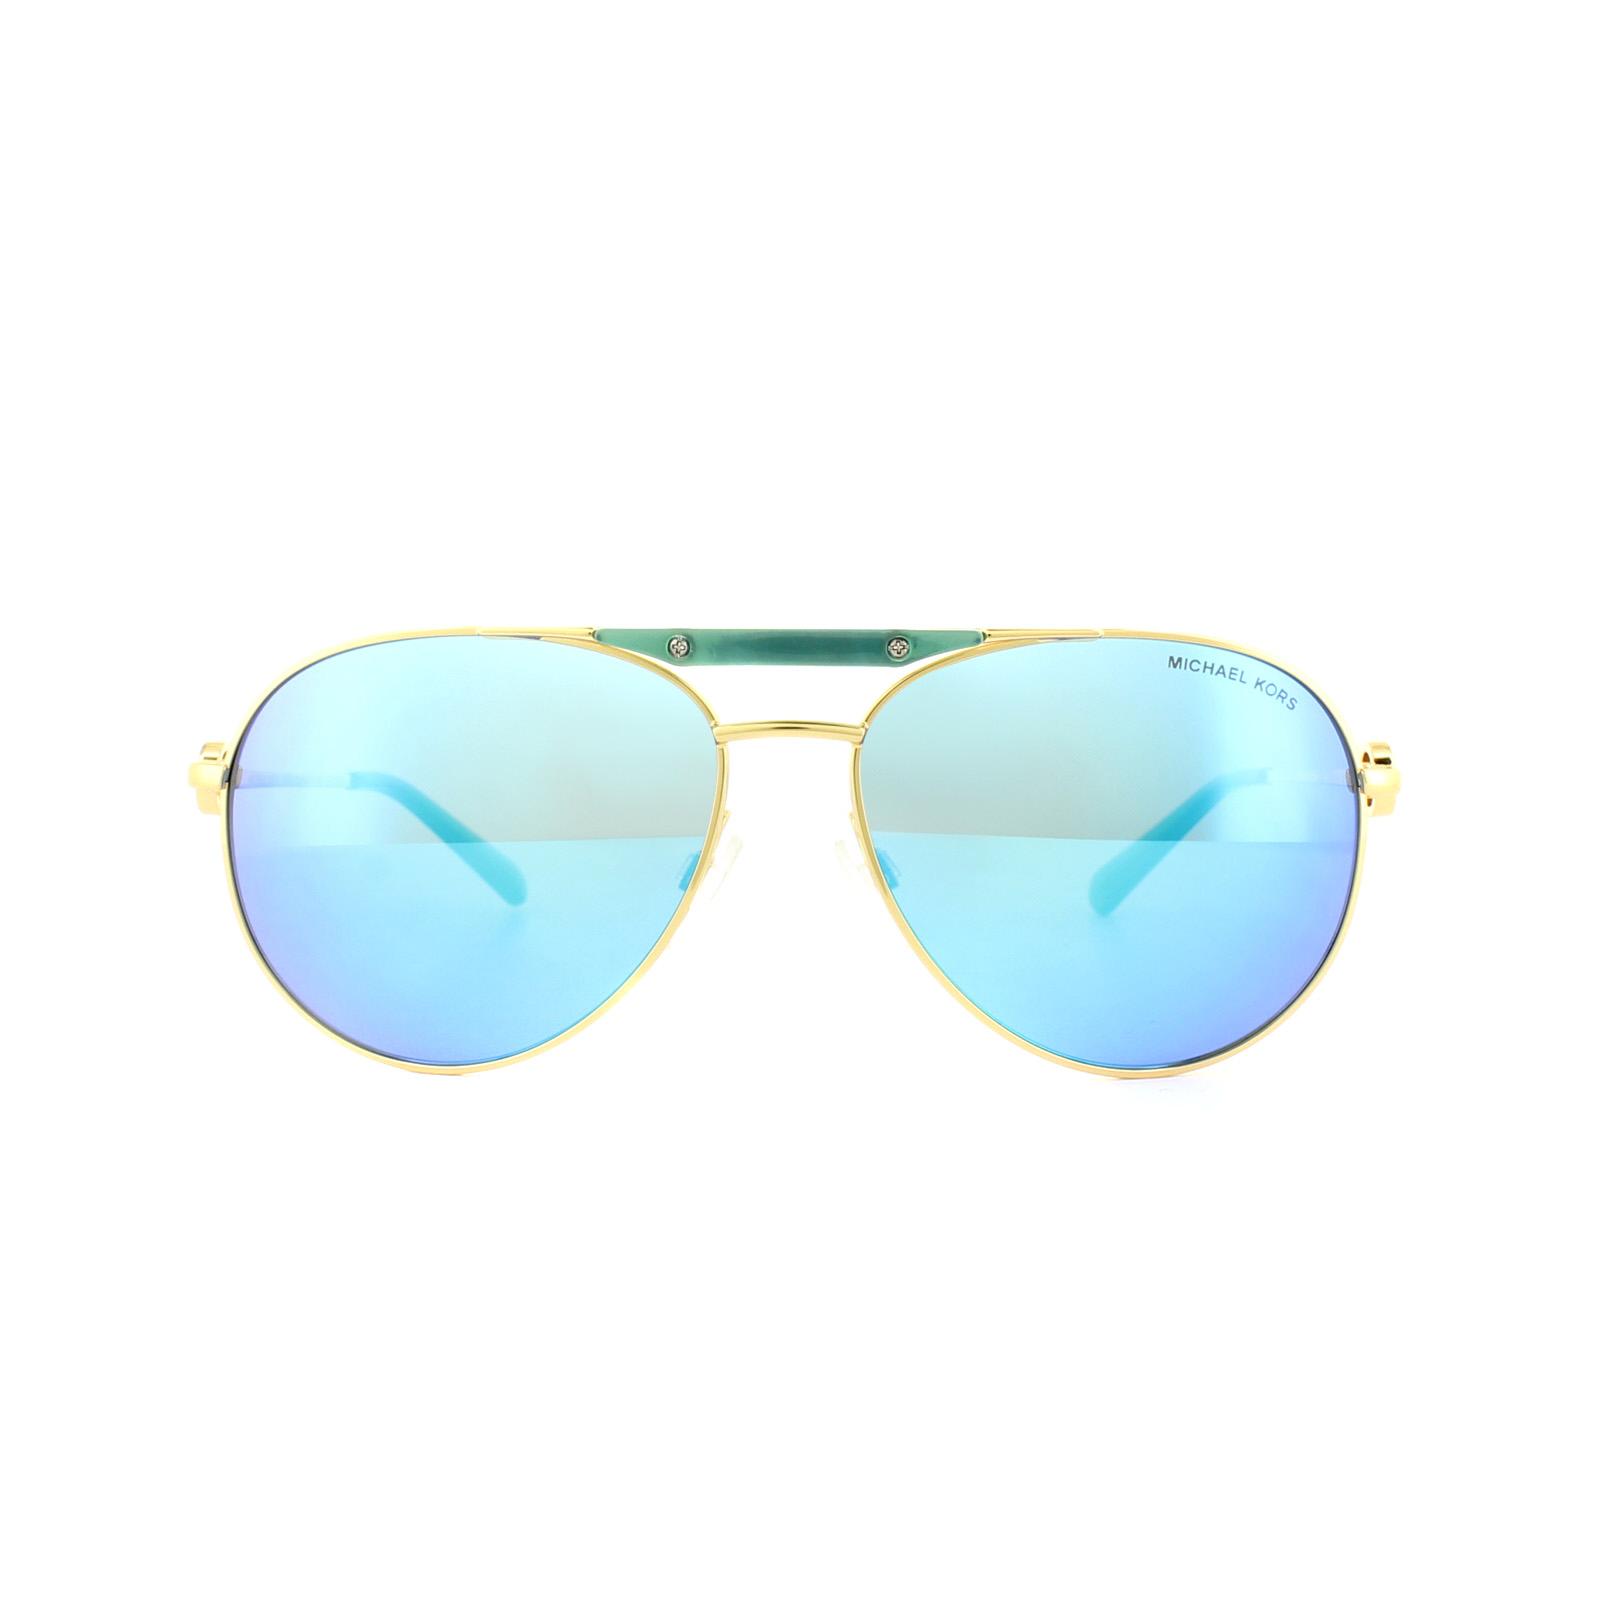 22db91dd47 Sentinel Michael Kors Sunglasses Zanzibar MK5001 109725 Gold and Turquoise Teal  Mirror